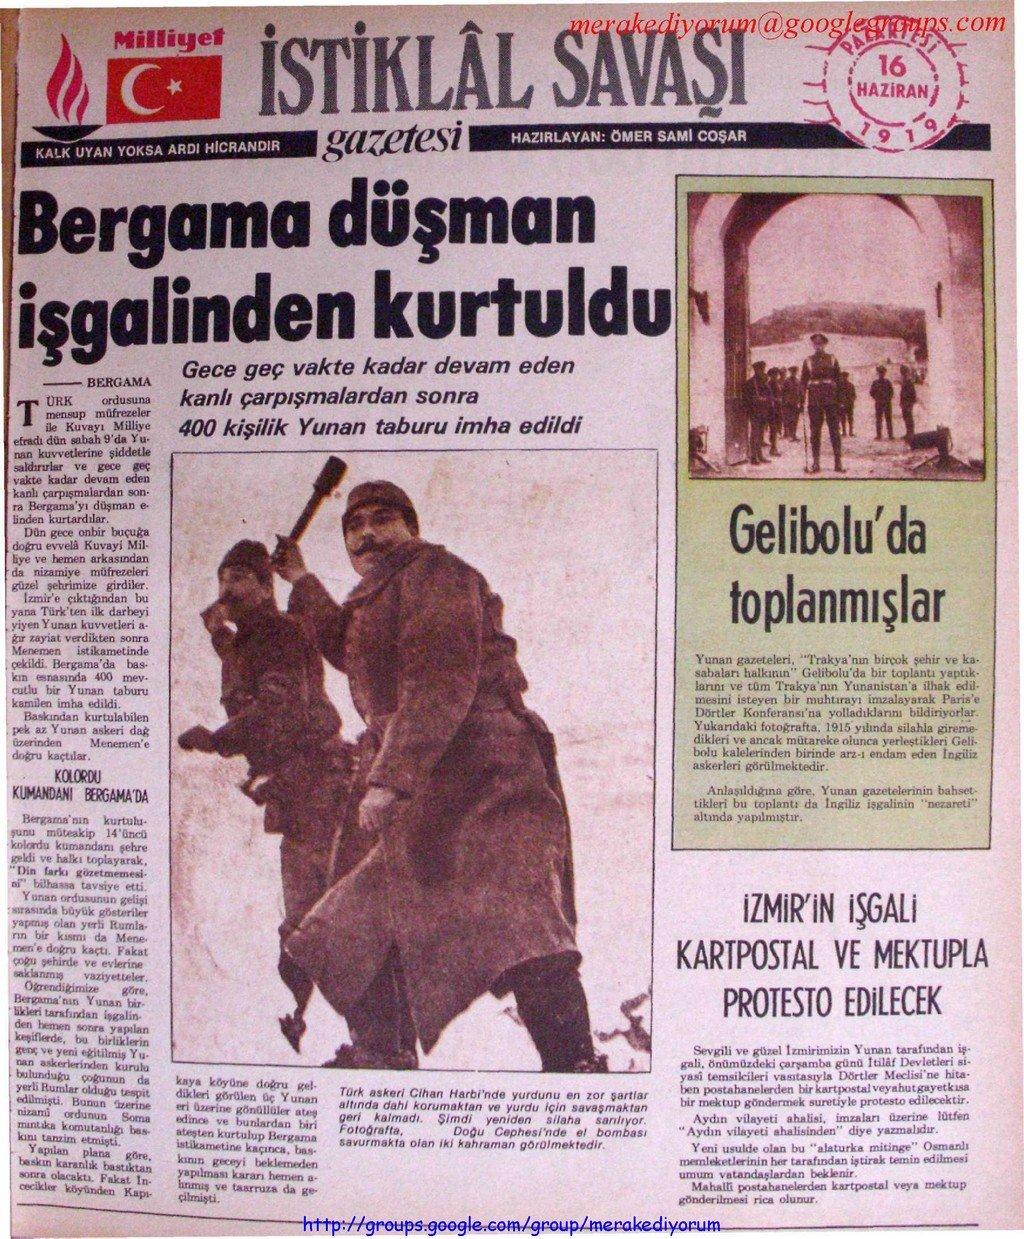 istiklal savaşı gazetesi - 16 haziran 1919